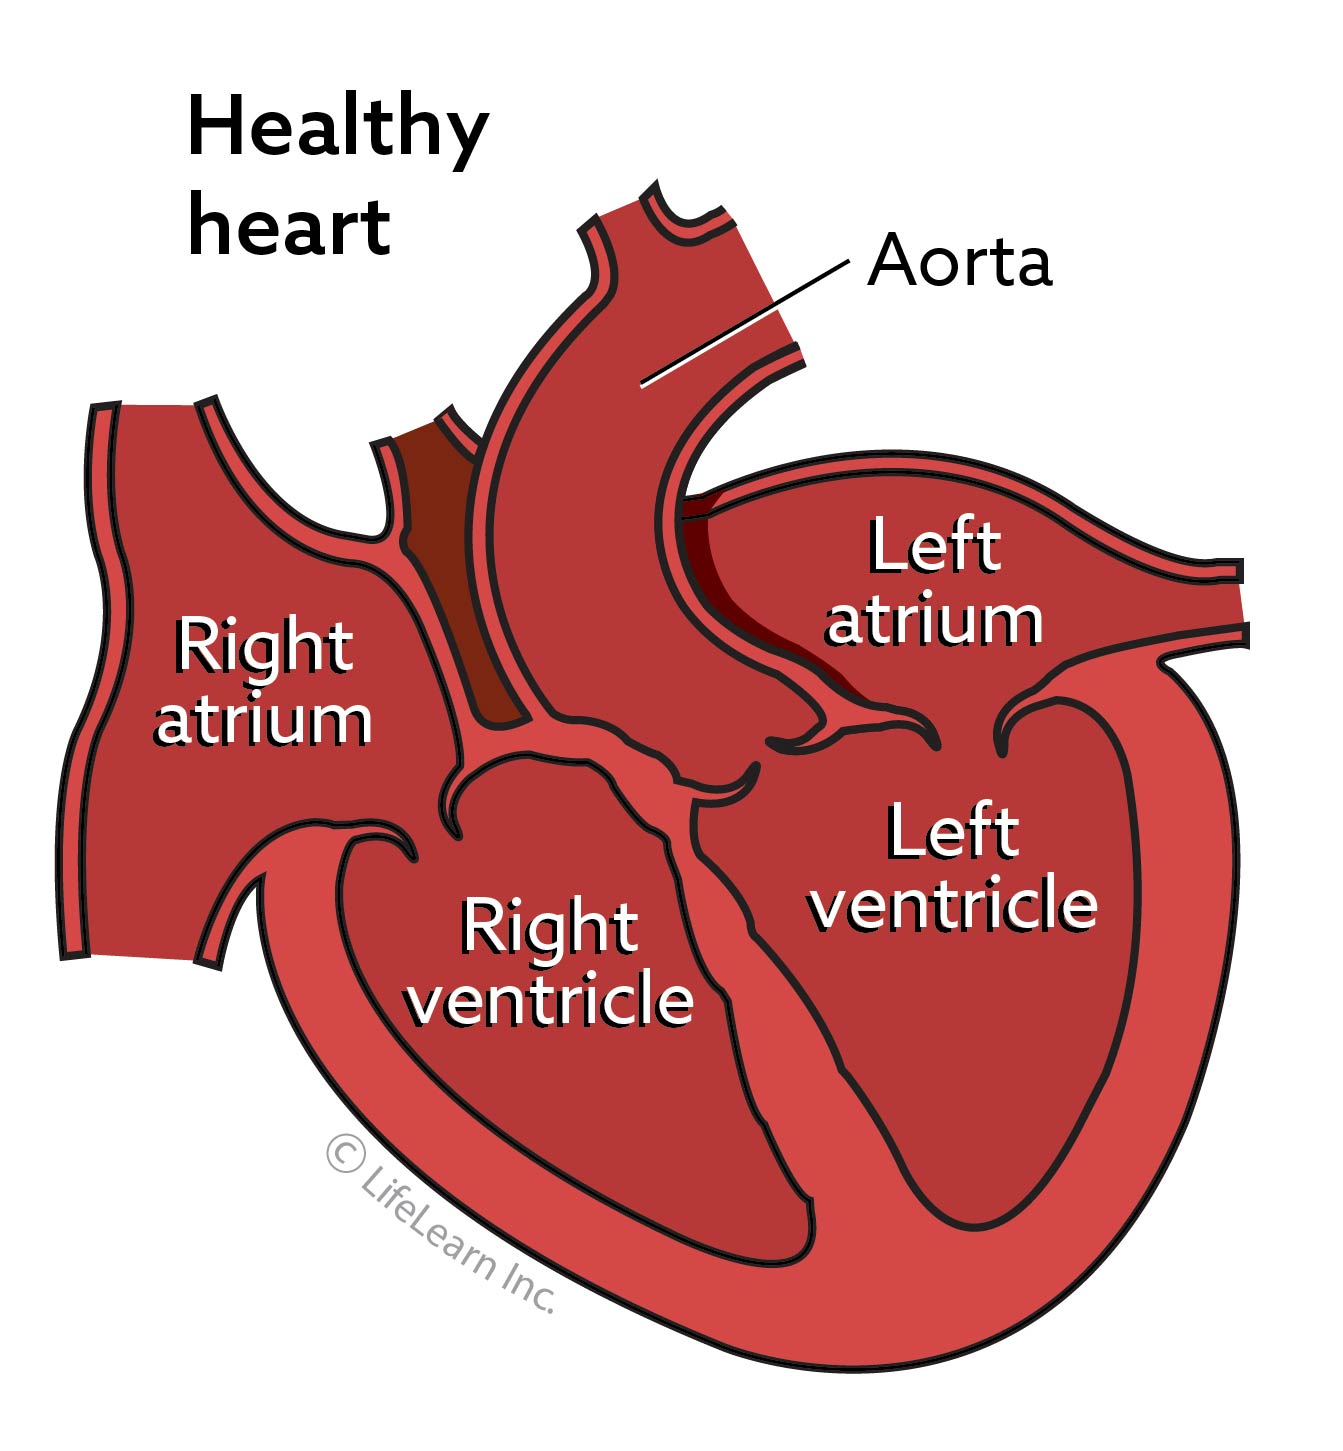 heart_disease_healthy_heart_updated2017-1-03